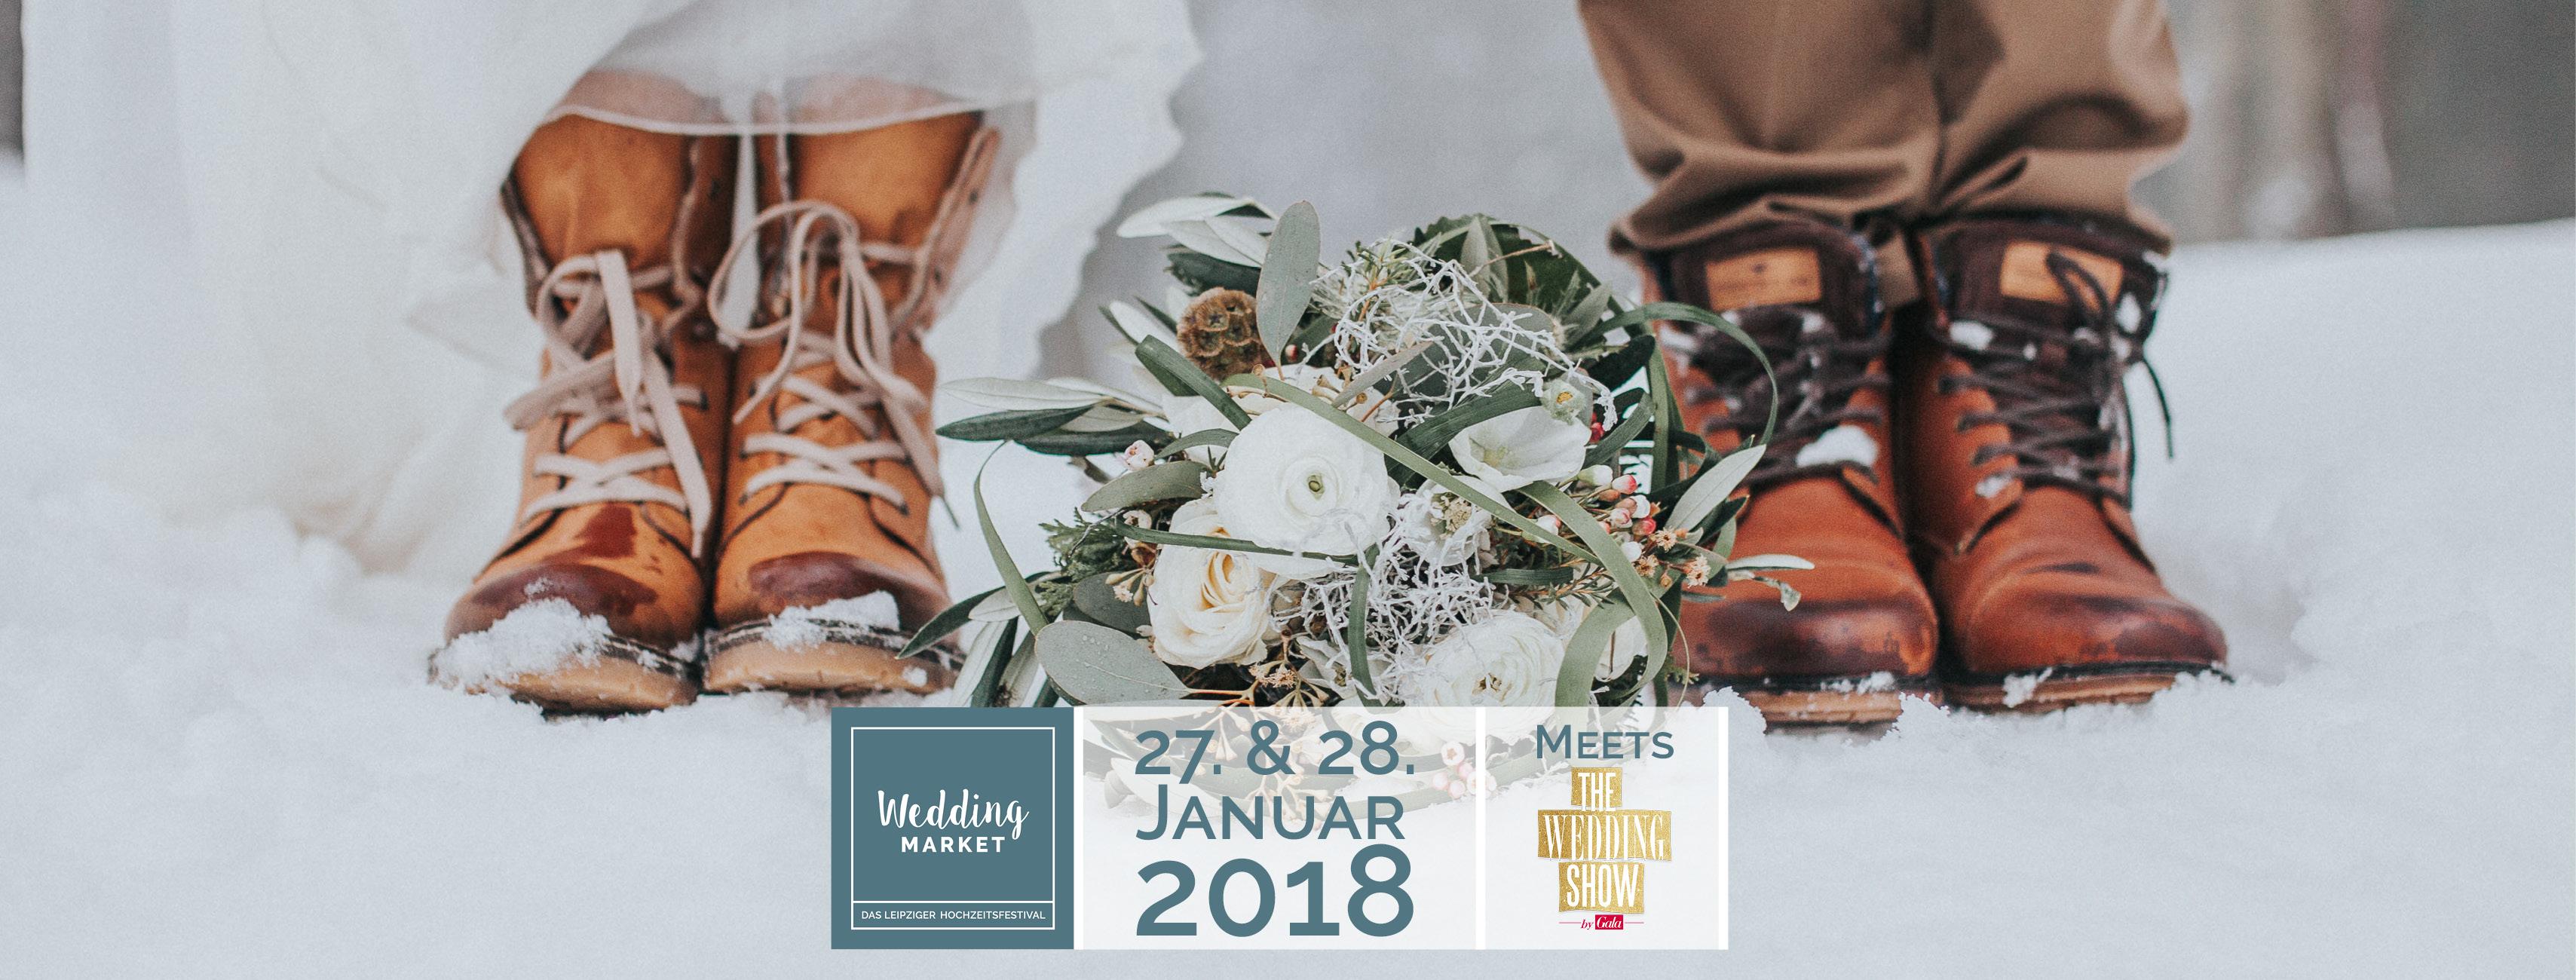 Wedding Market 2018